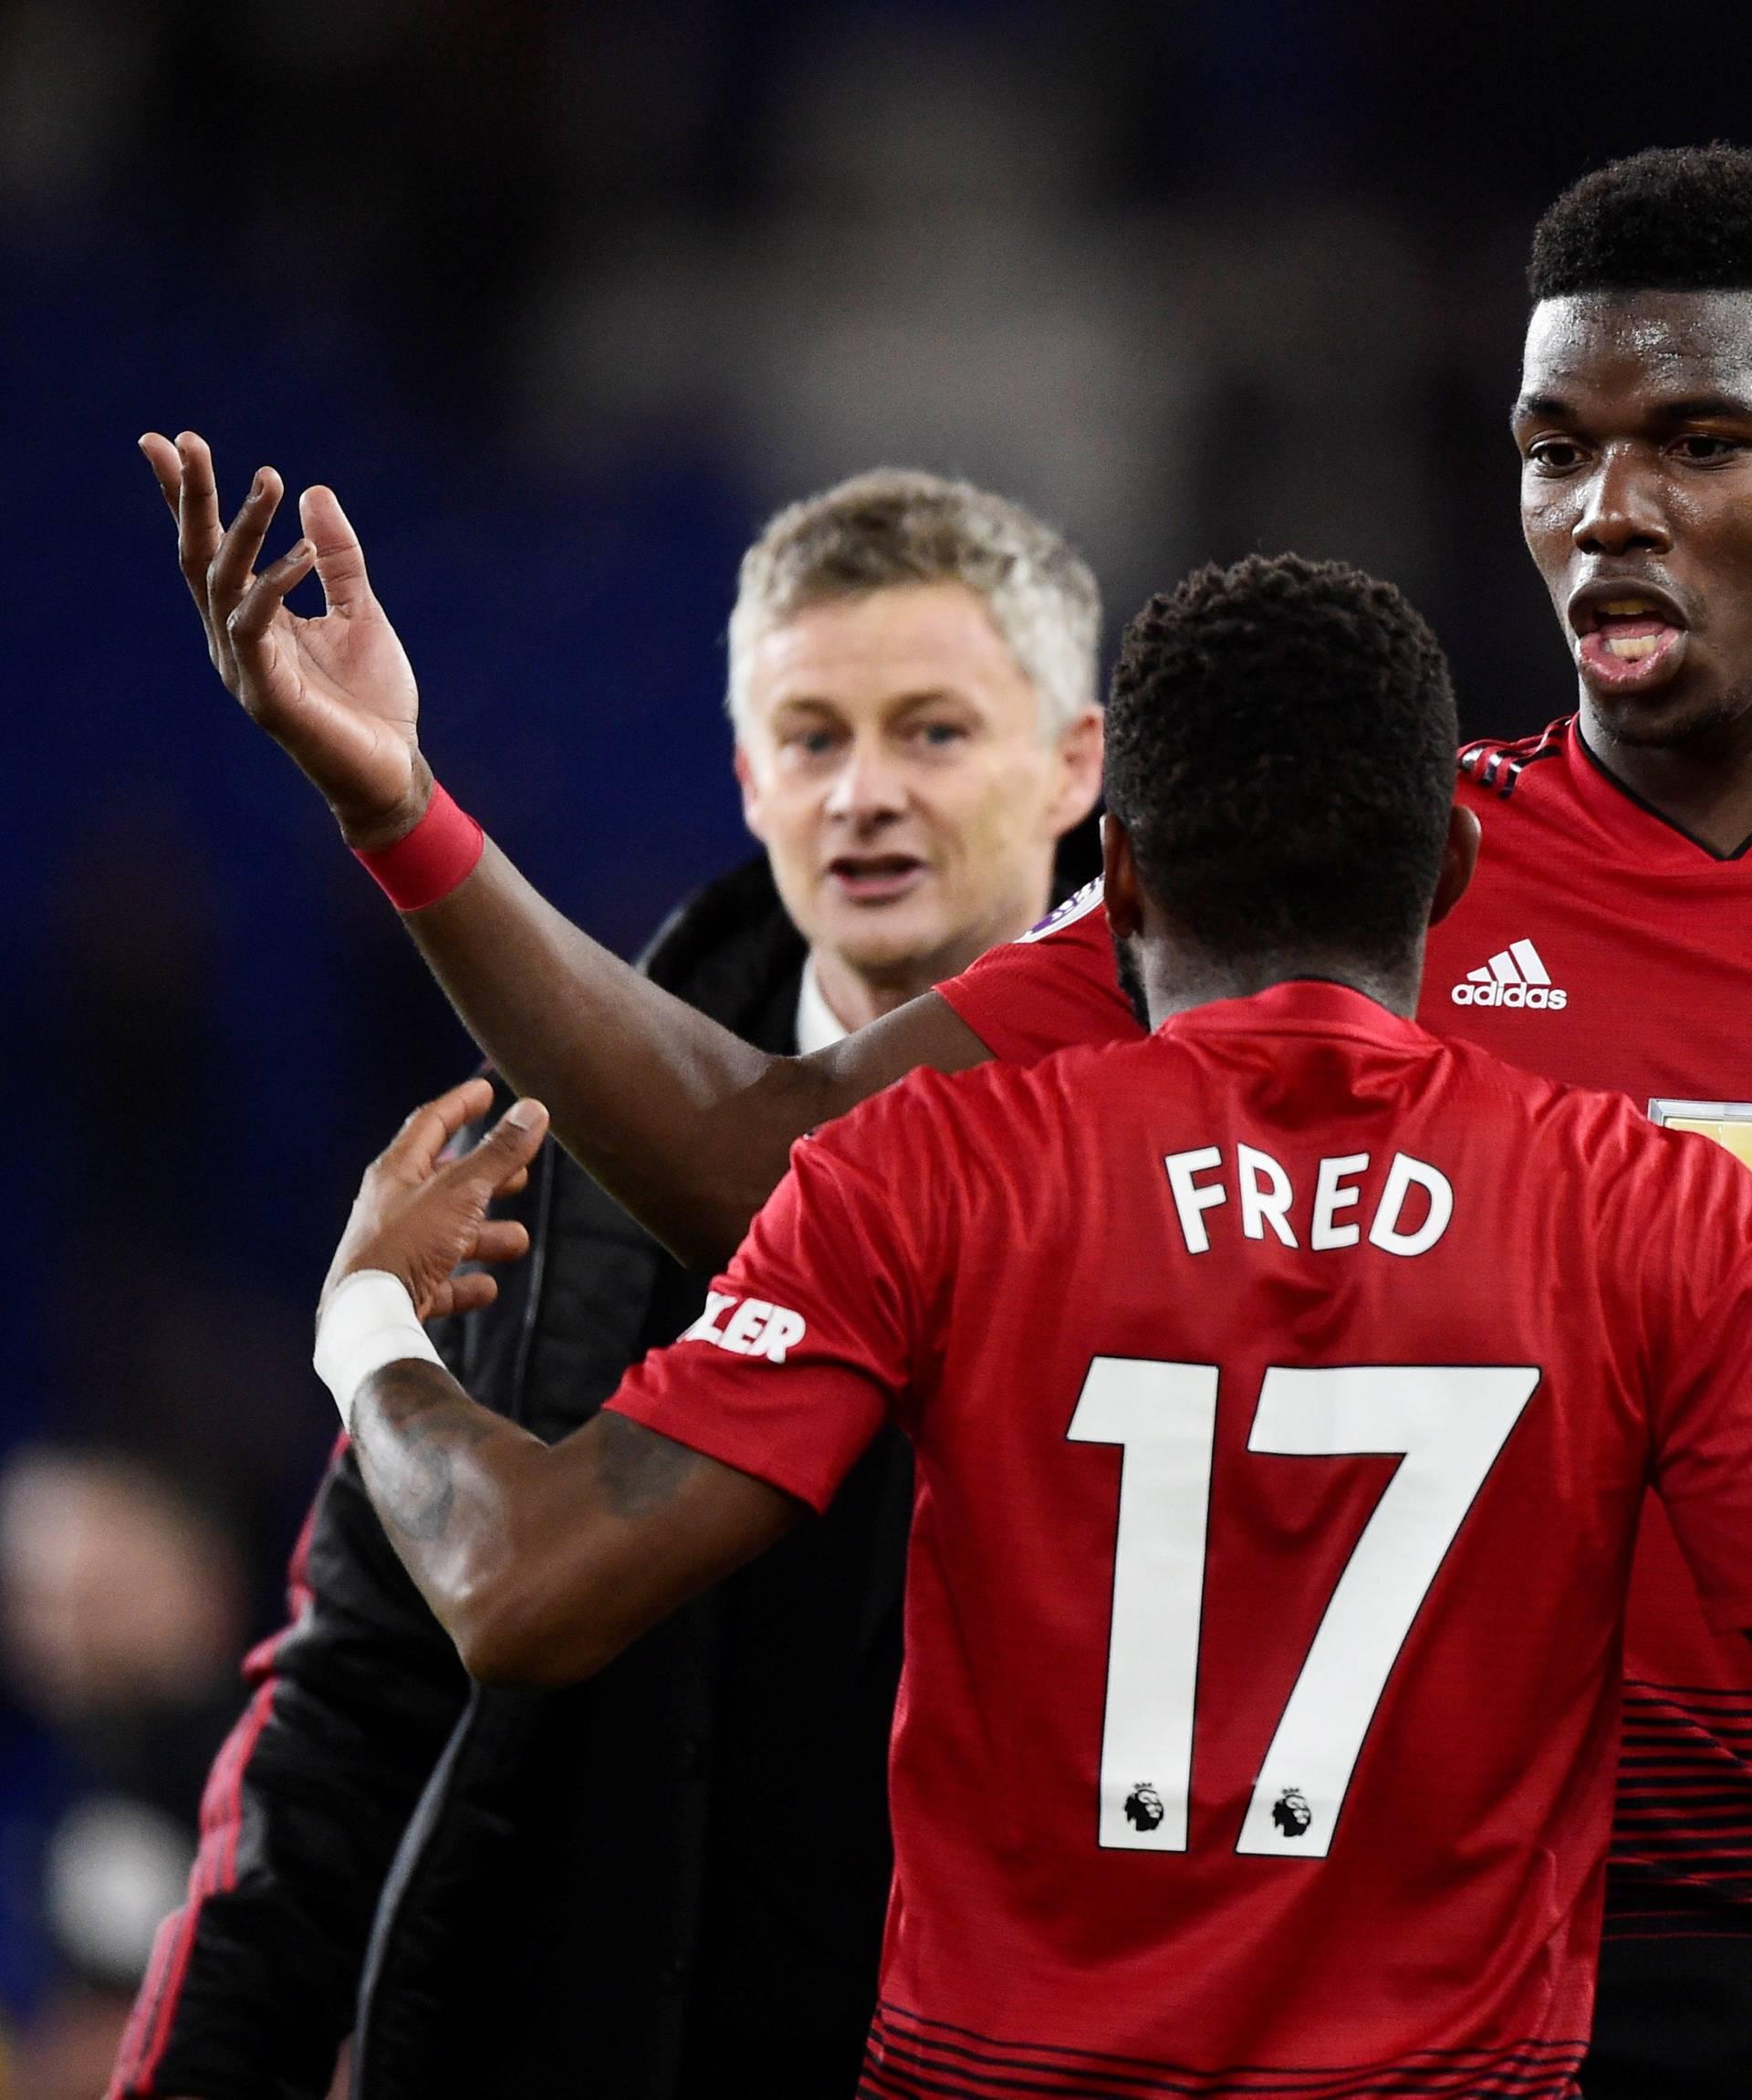 Premier League - Cardiff City v Manchester United